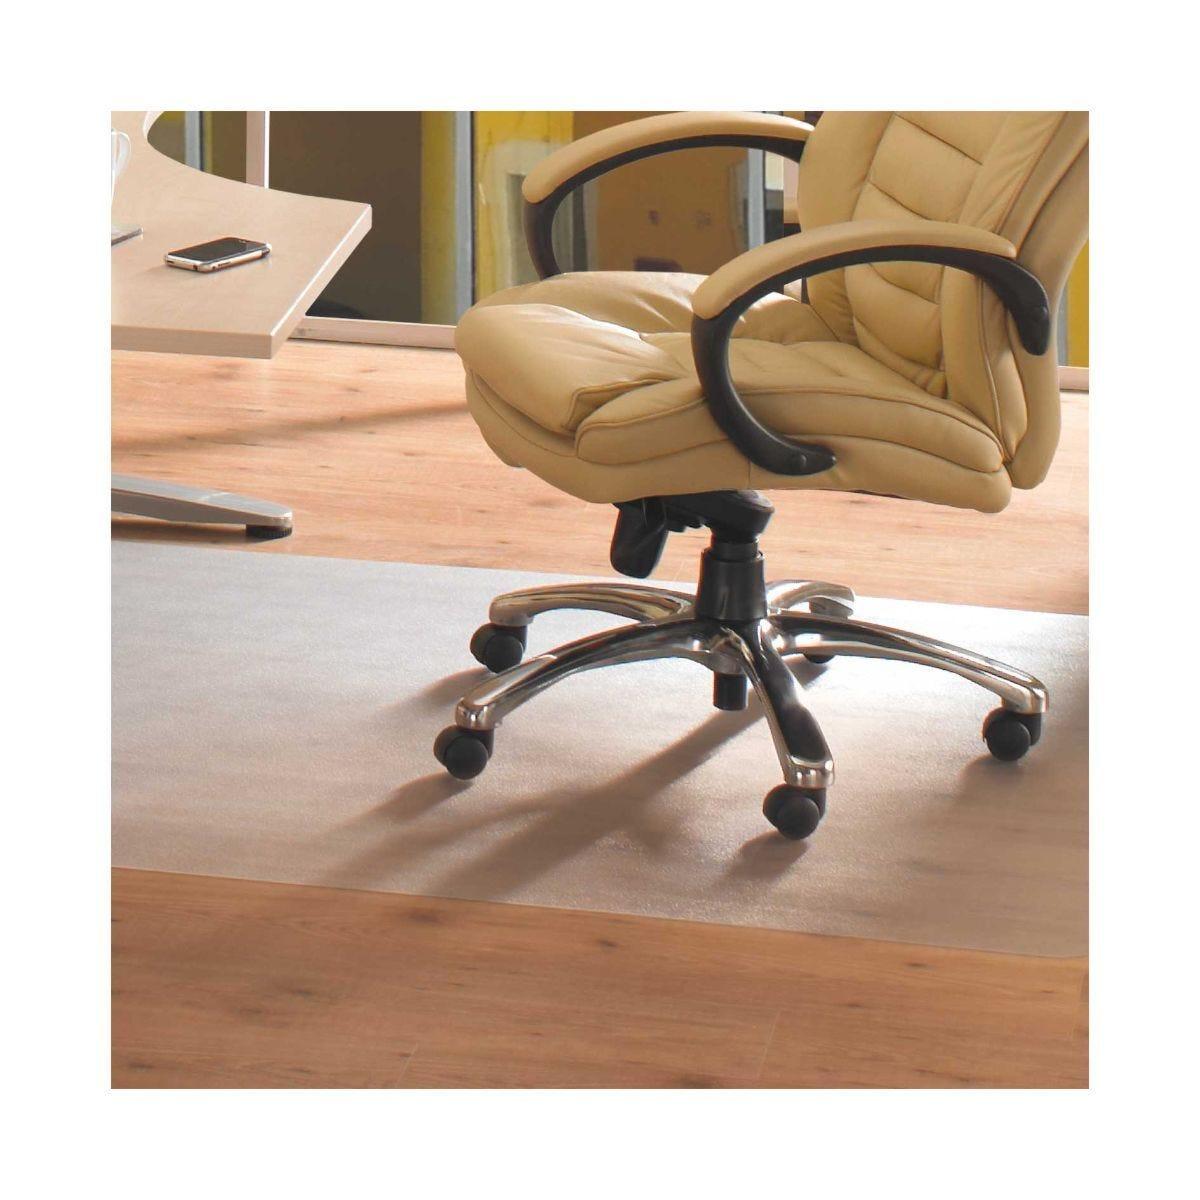 PVC Advantage Hard Floor Chairmat Rectangular Shape 120cm x 90cm